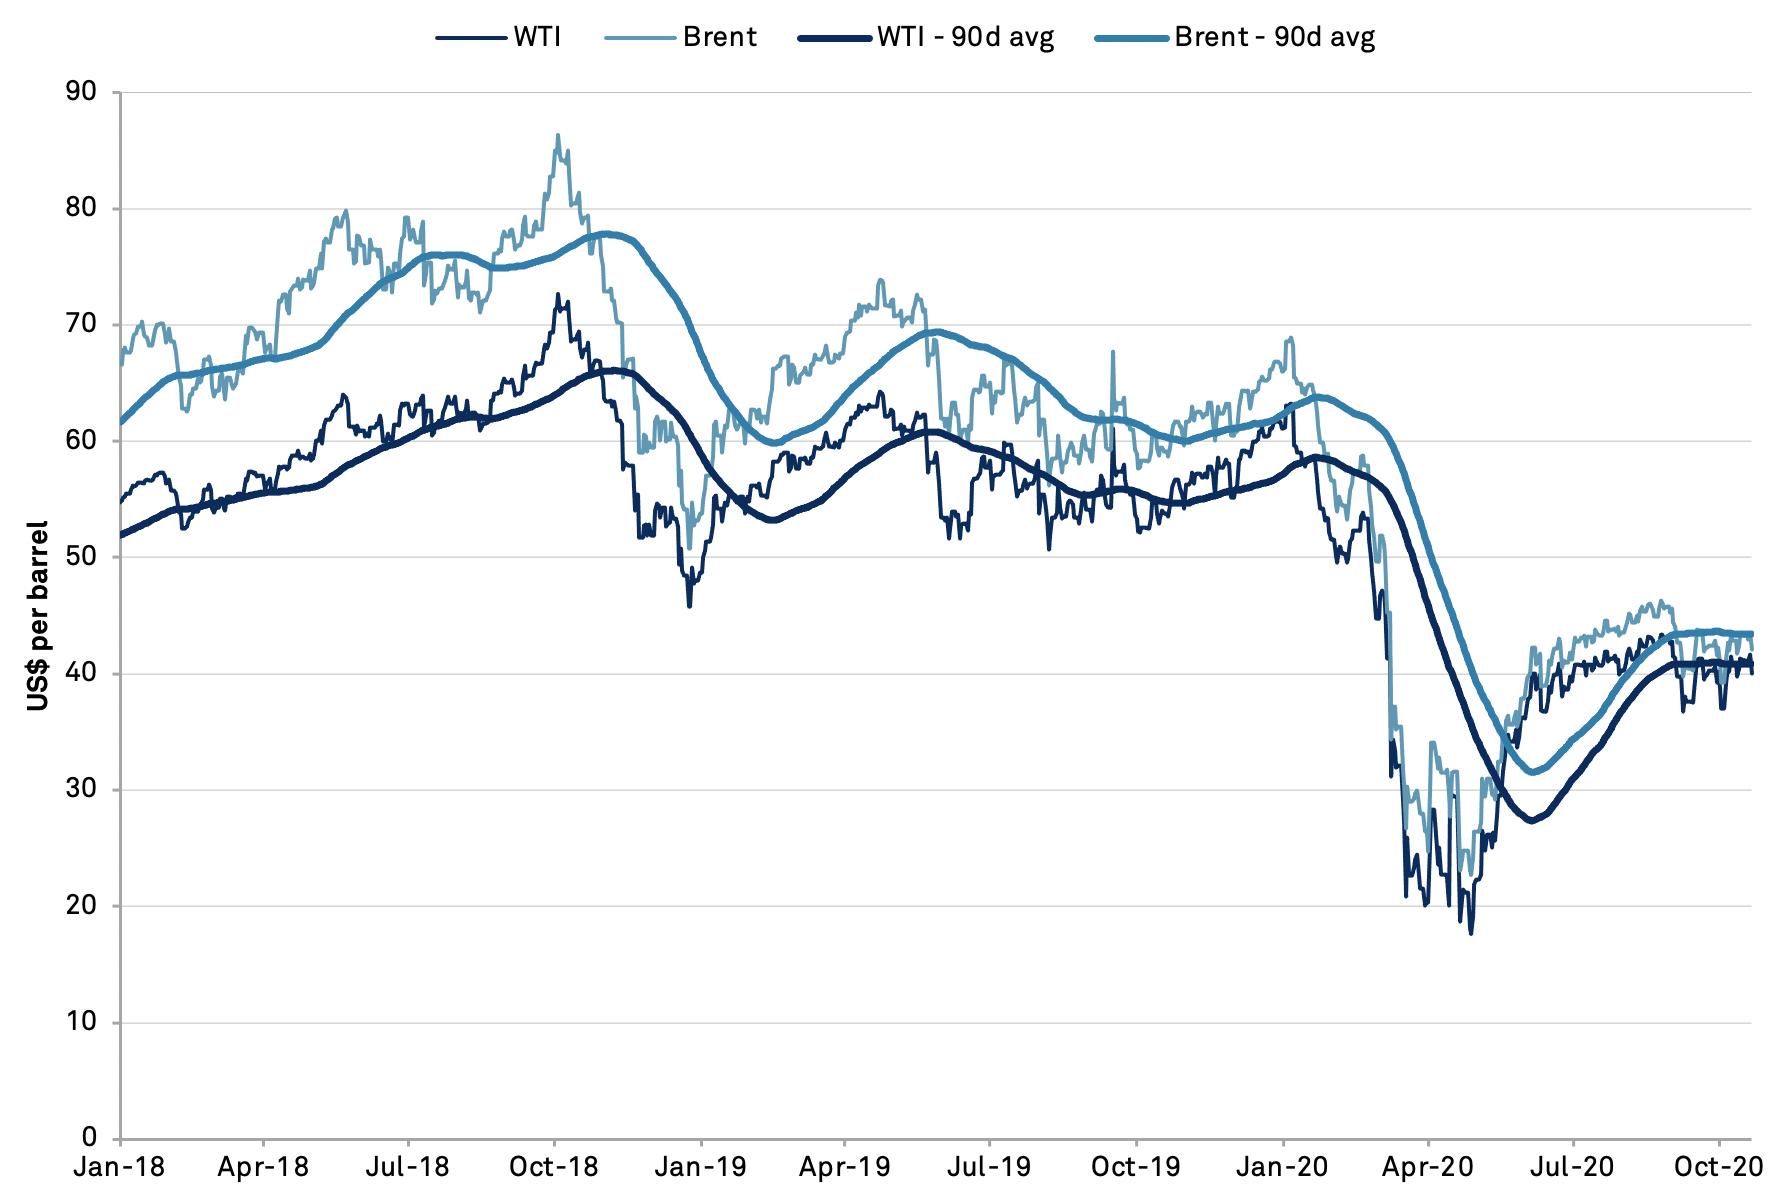 20201023-oil-prices